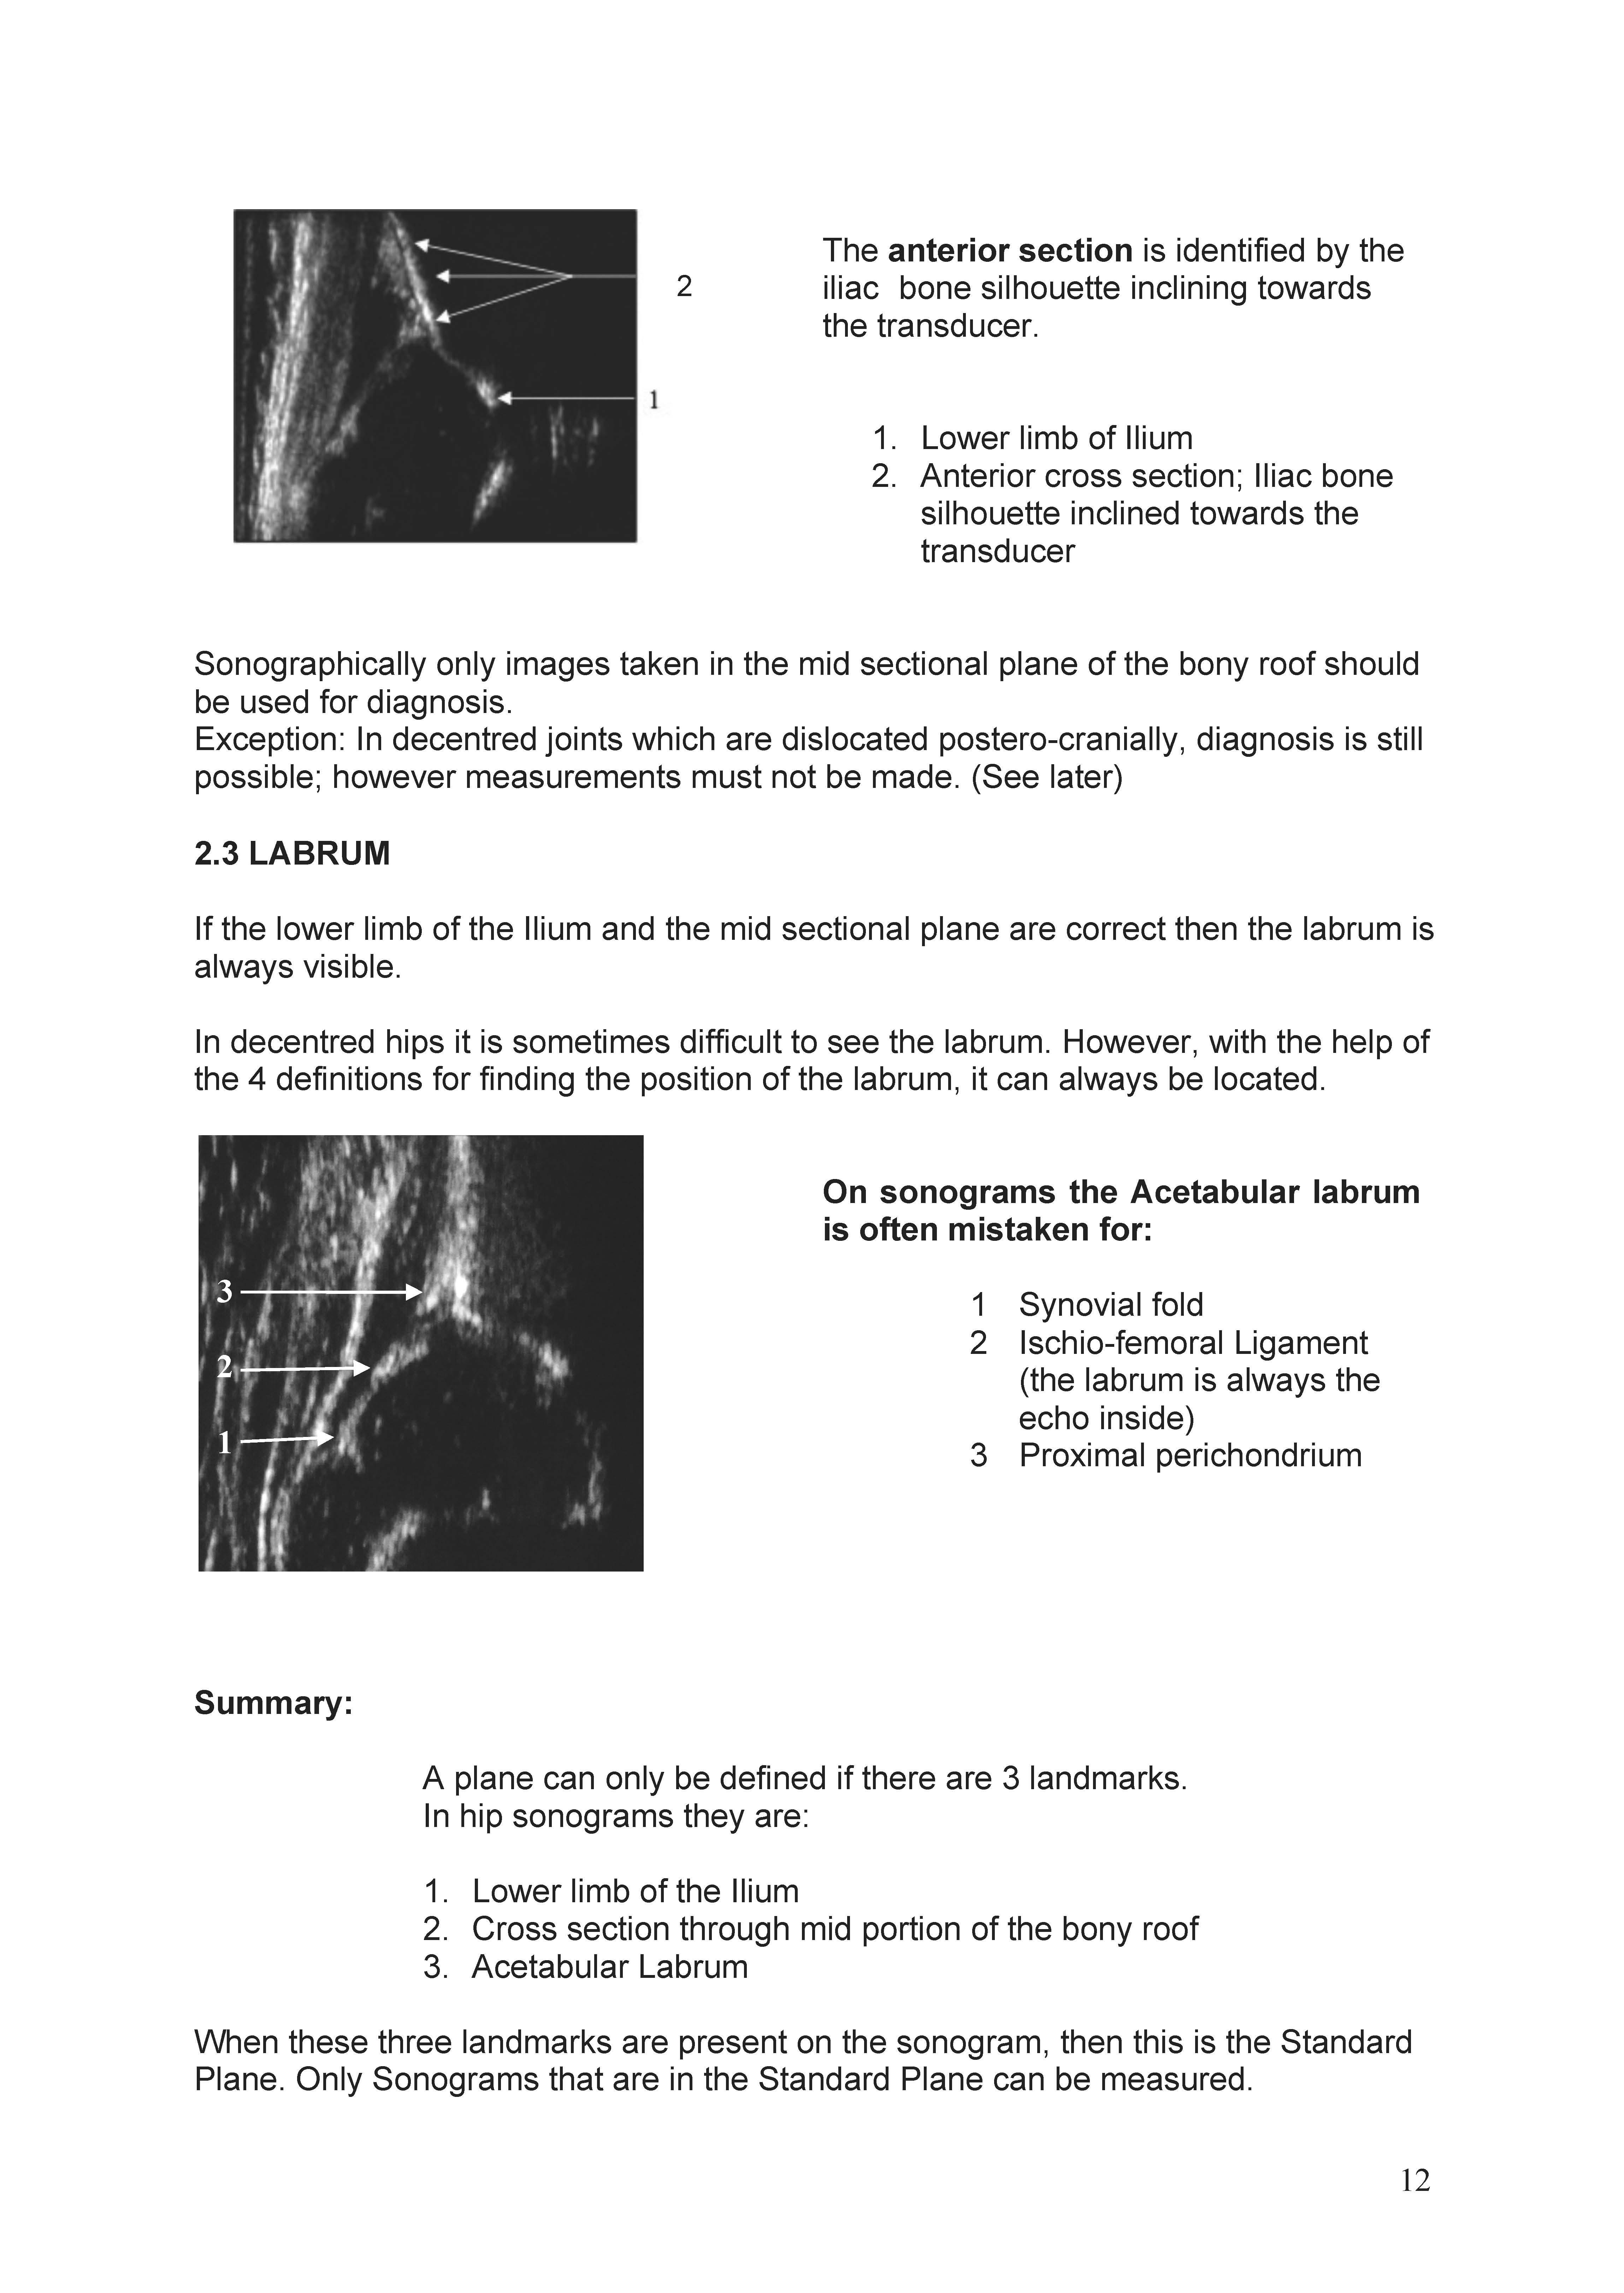 https://0501.nccdn.net/4_2/000/000/076/de9/ManualHip-Sonography--Ma_rz-2017-1_Seite_12-4597x6490.jpg